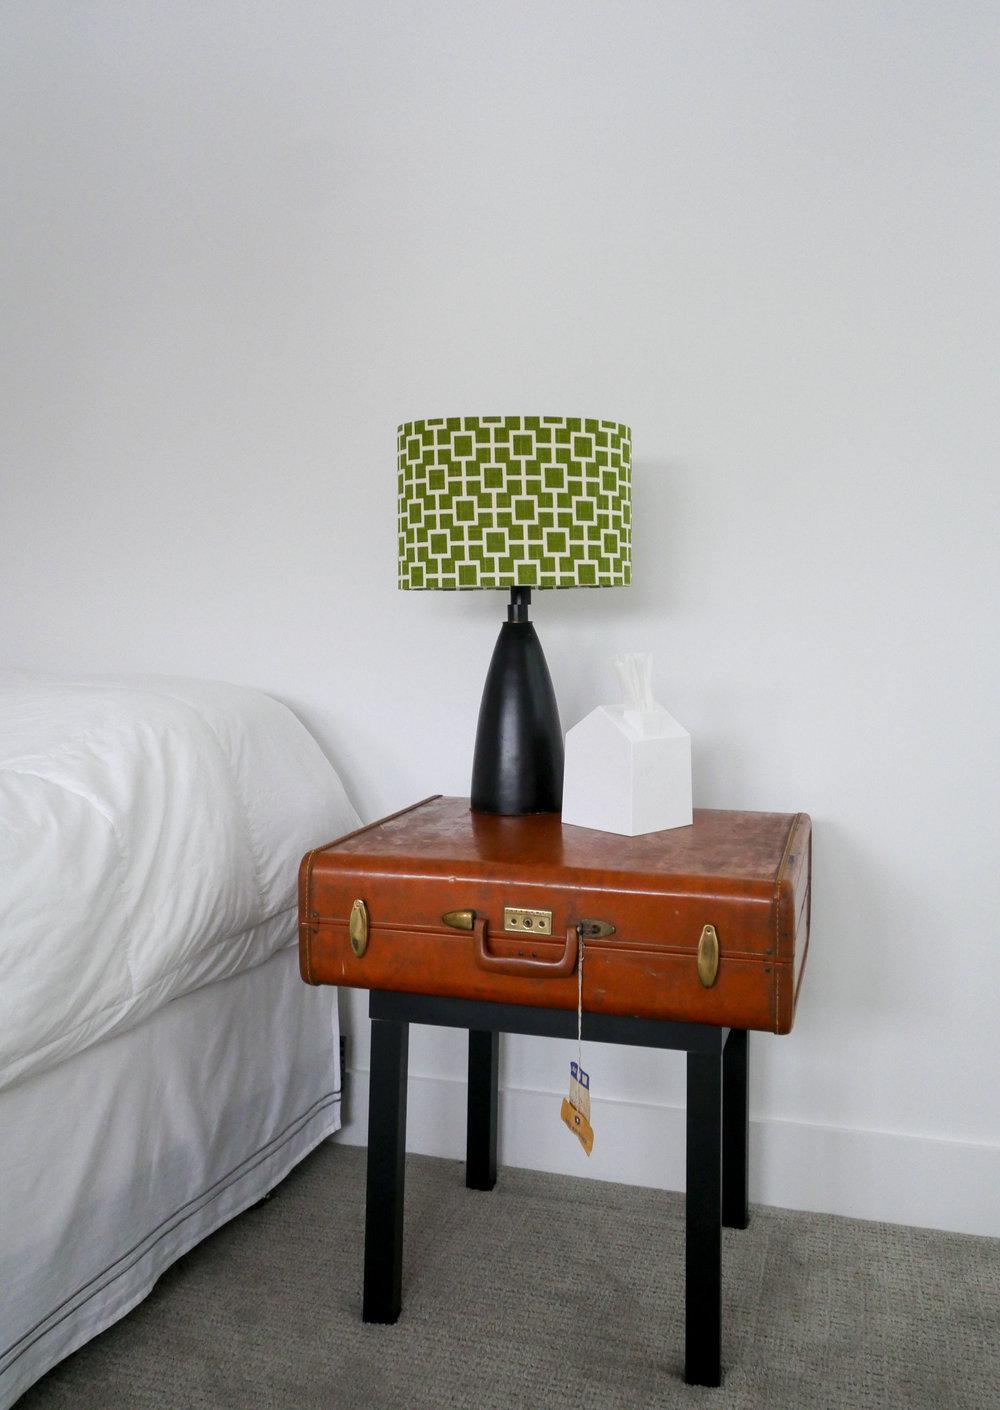 LAMP_FINAL-copy.jpg